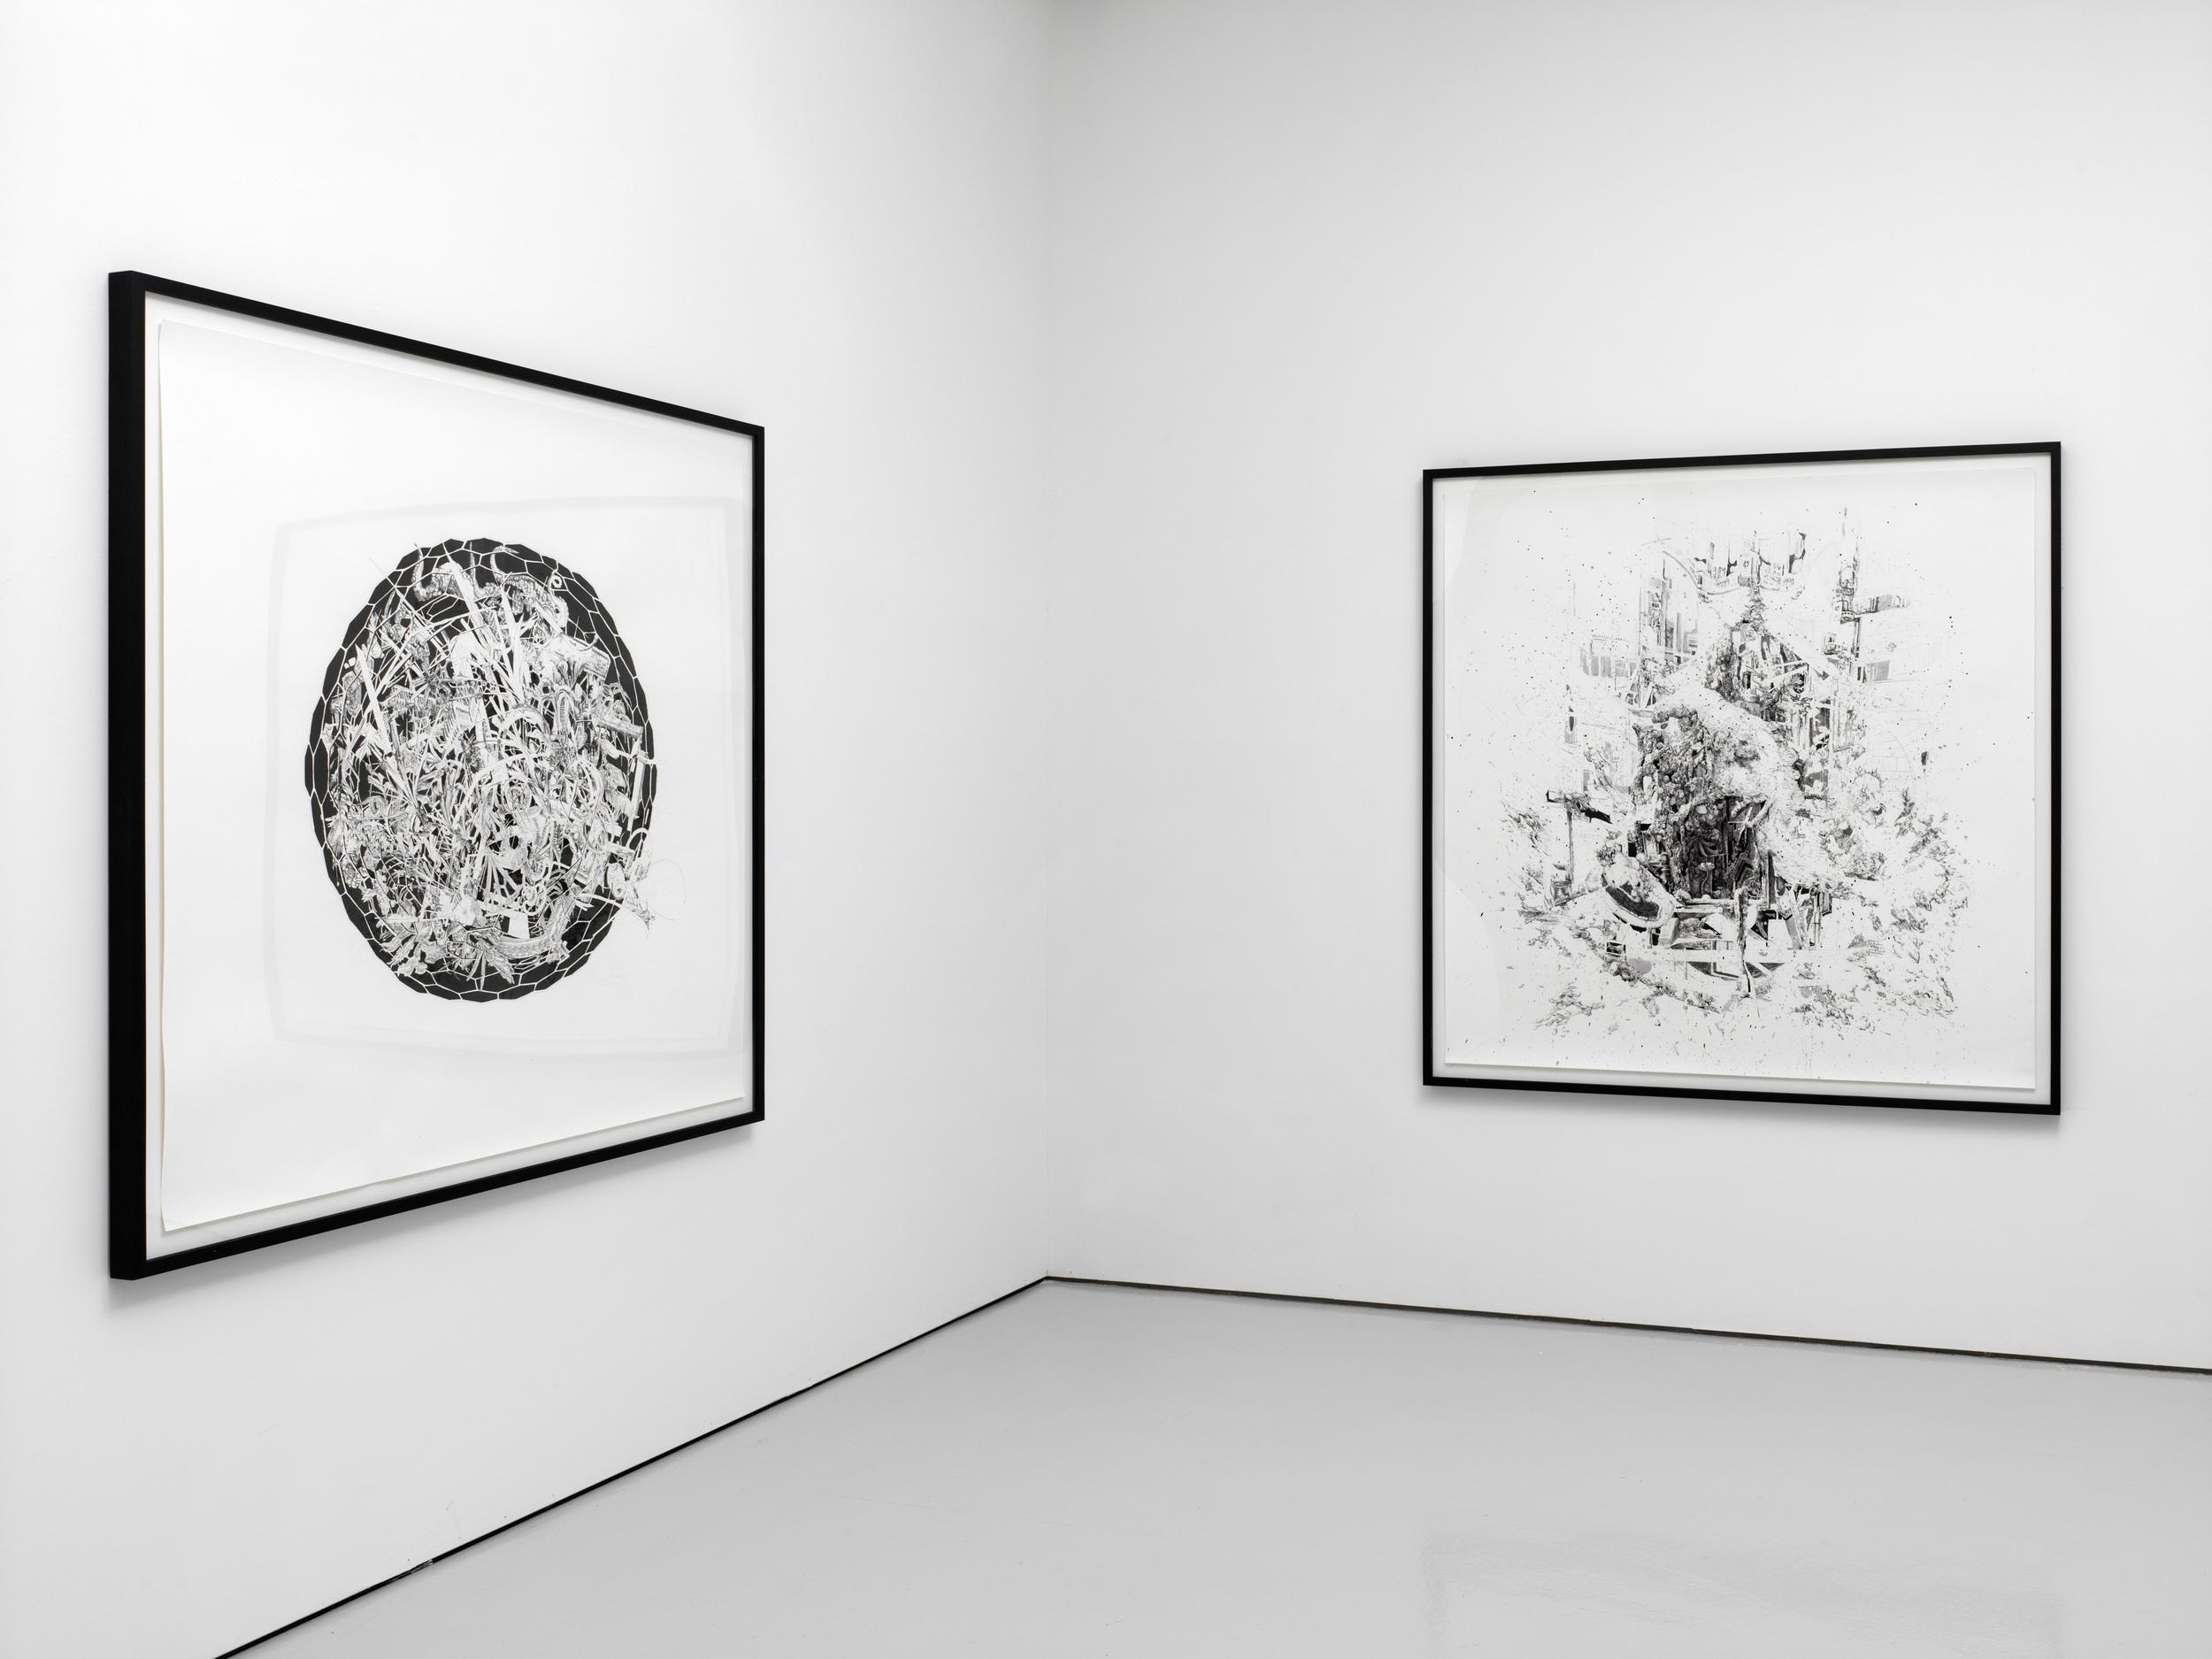 exhibition_view_drawing_a_universe_at_Kai10_Düsseldorf_2013.jpg